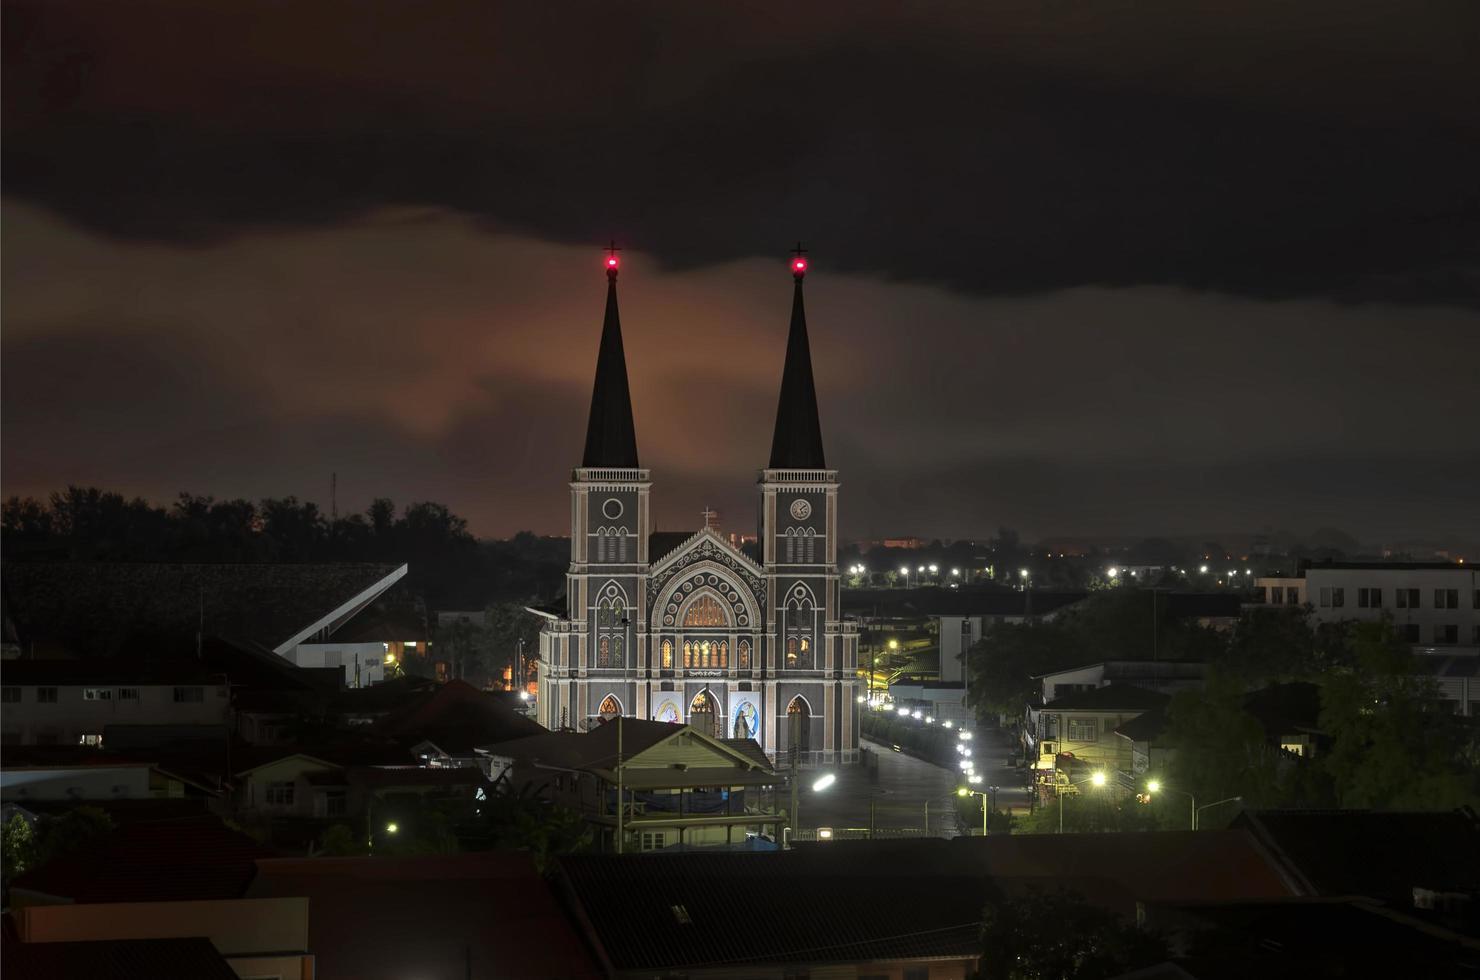 katholieke kerk 's nachts in thailand foto